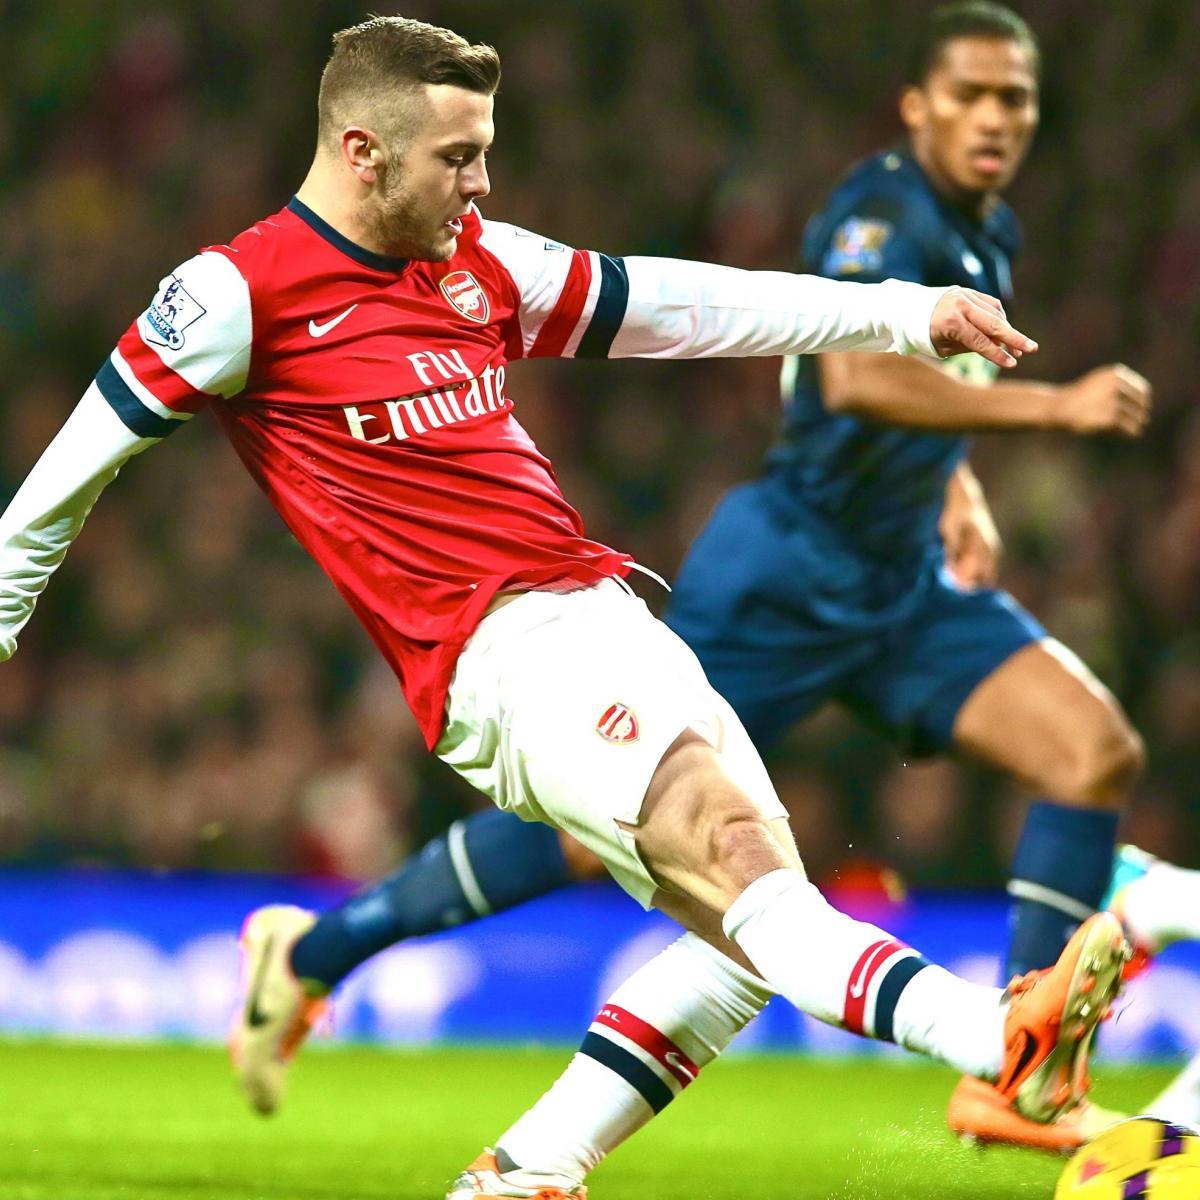 Psg Vs Manchester City Live Score Highlights From: Arsenal Vs. Manchester United: Premier League Live Score